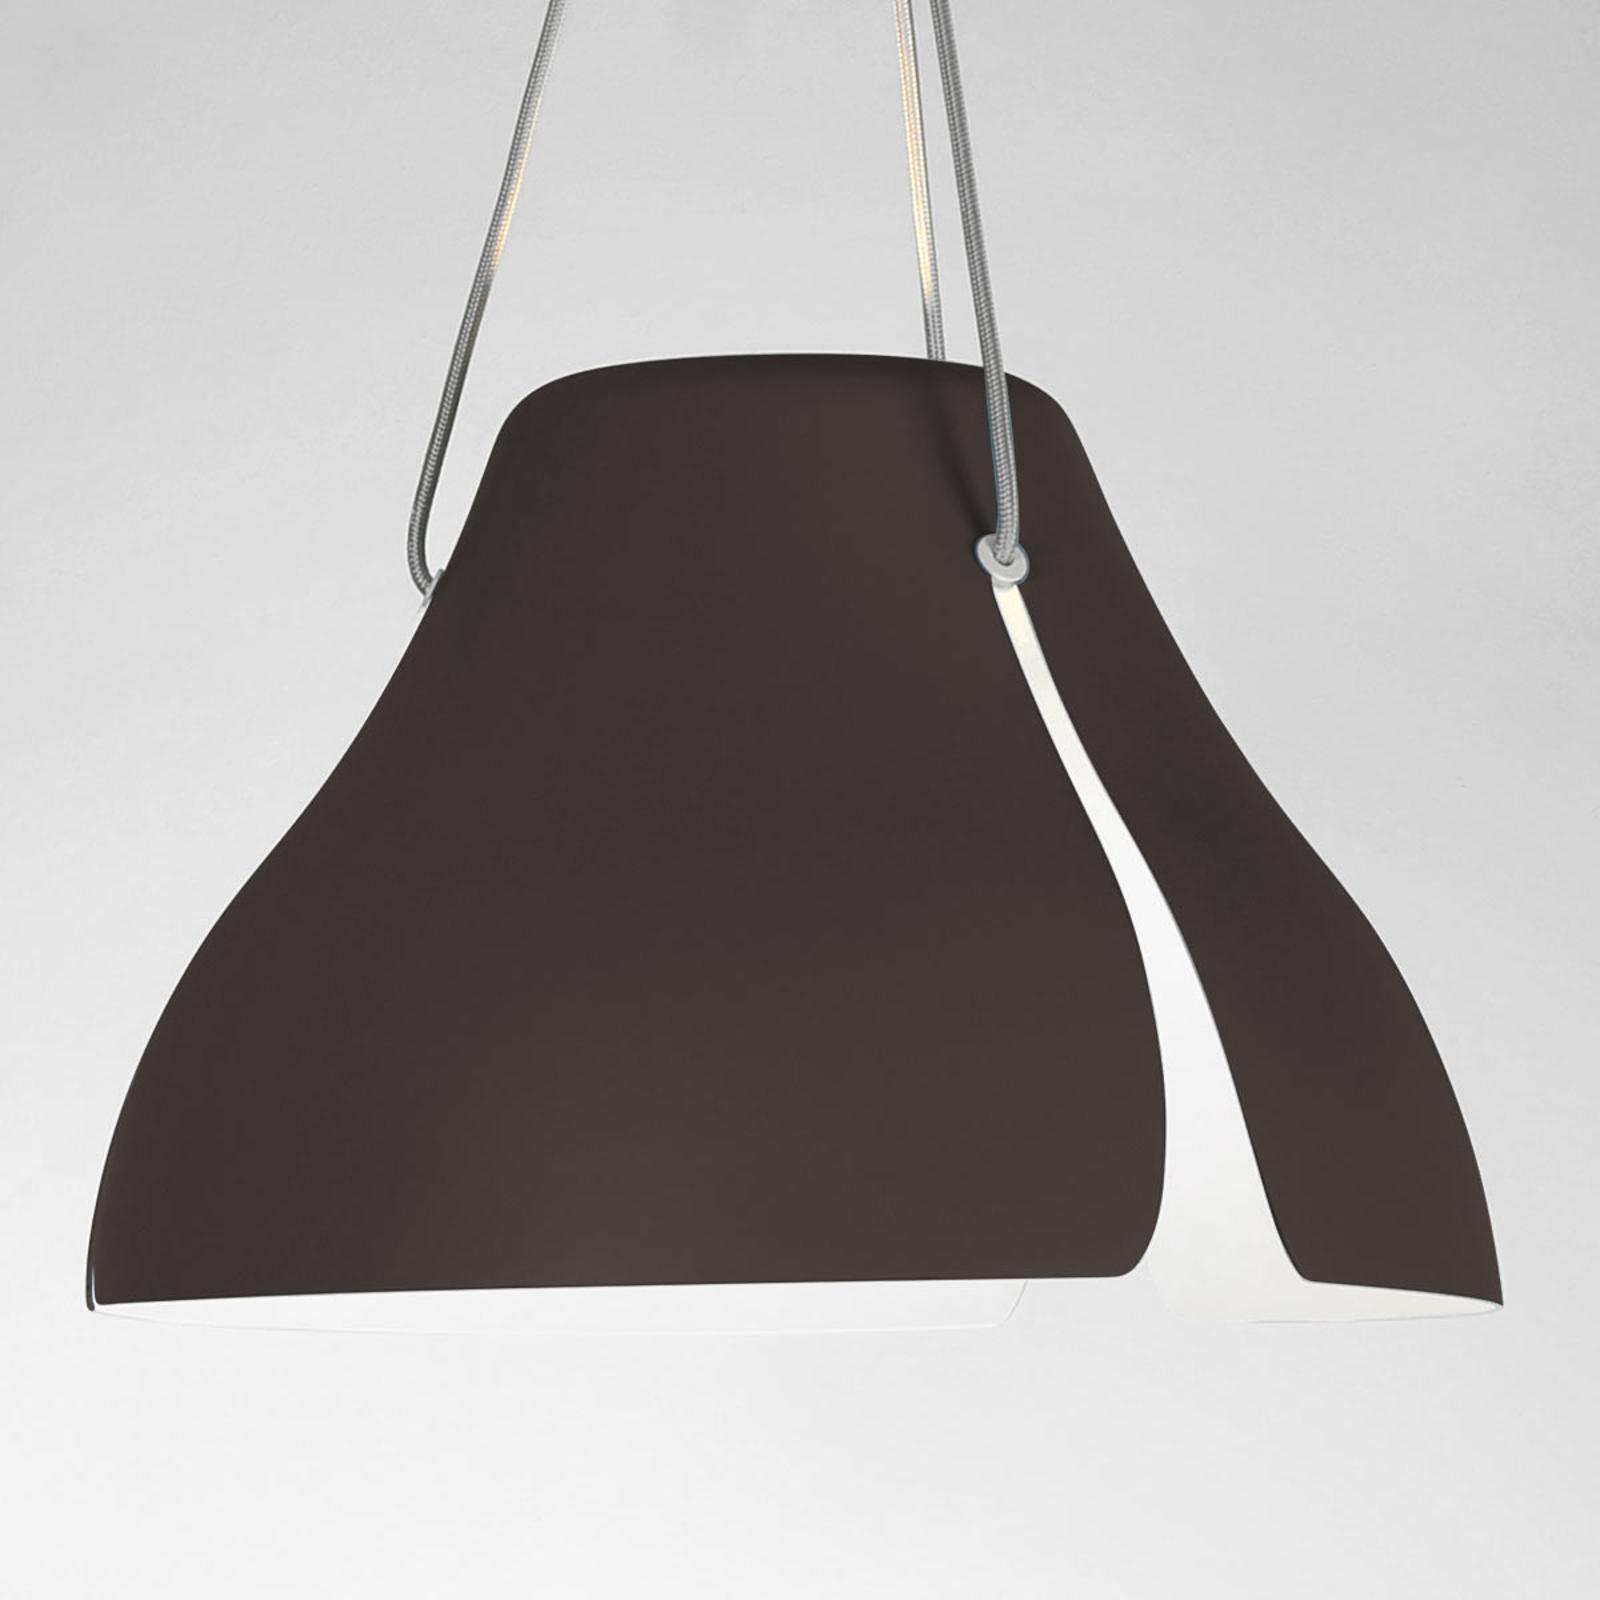 Suspension LED Gingko S40 40 cm brune